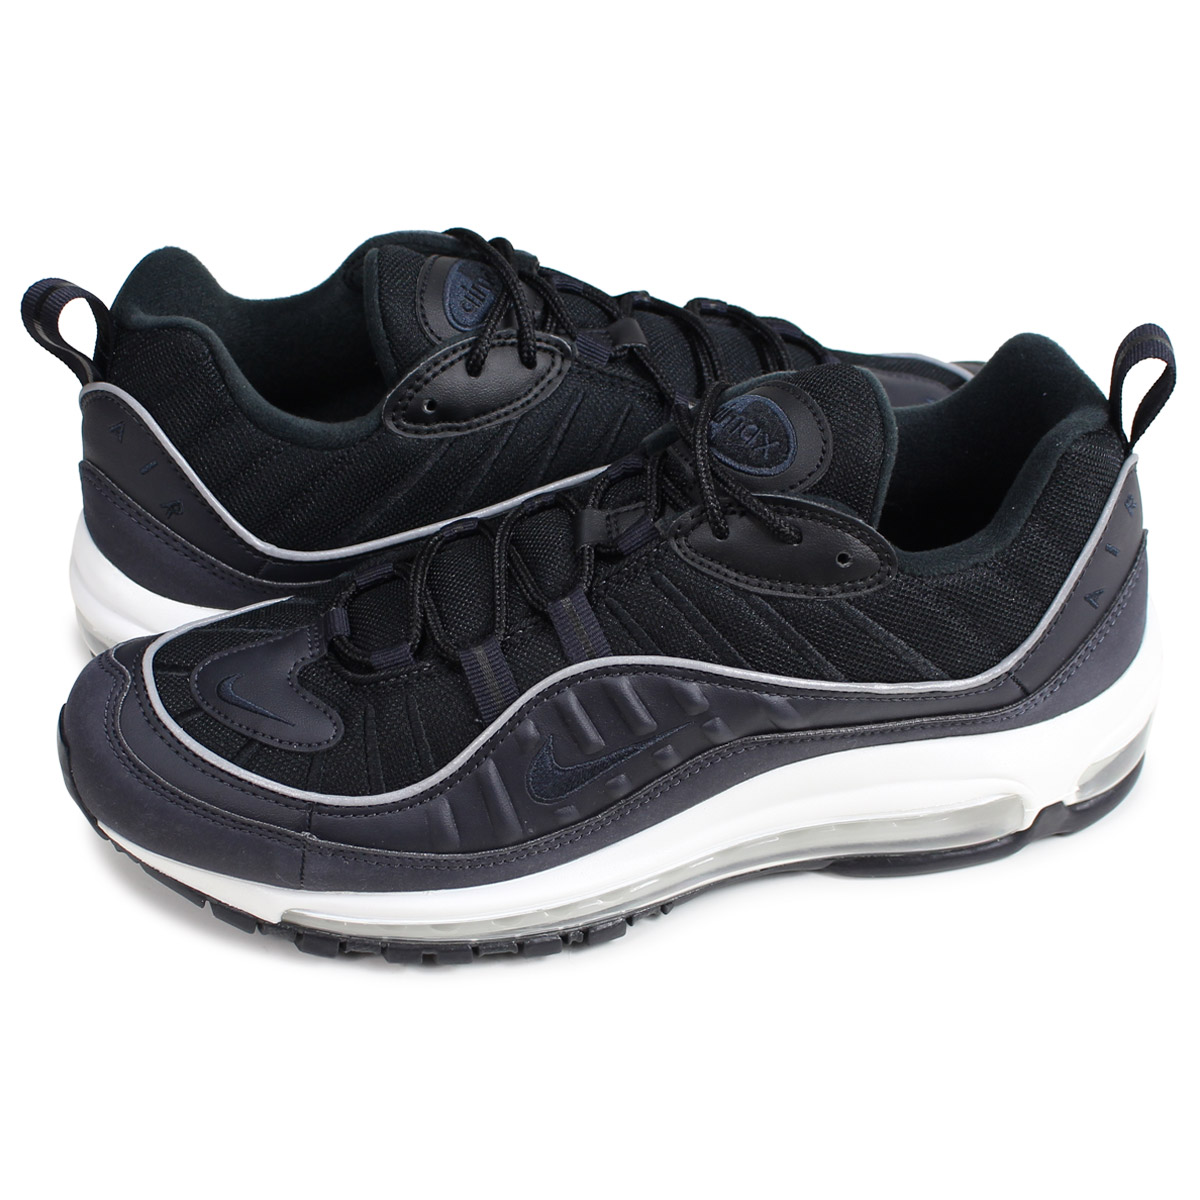 Nike Air Max 98 Air Max 98 joggeskoJD Sports Air Max 98 joggesko JD Sports